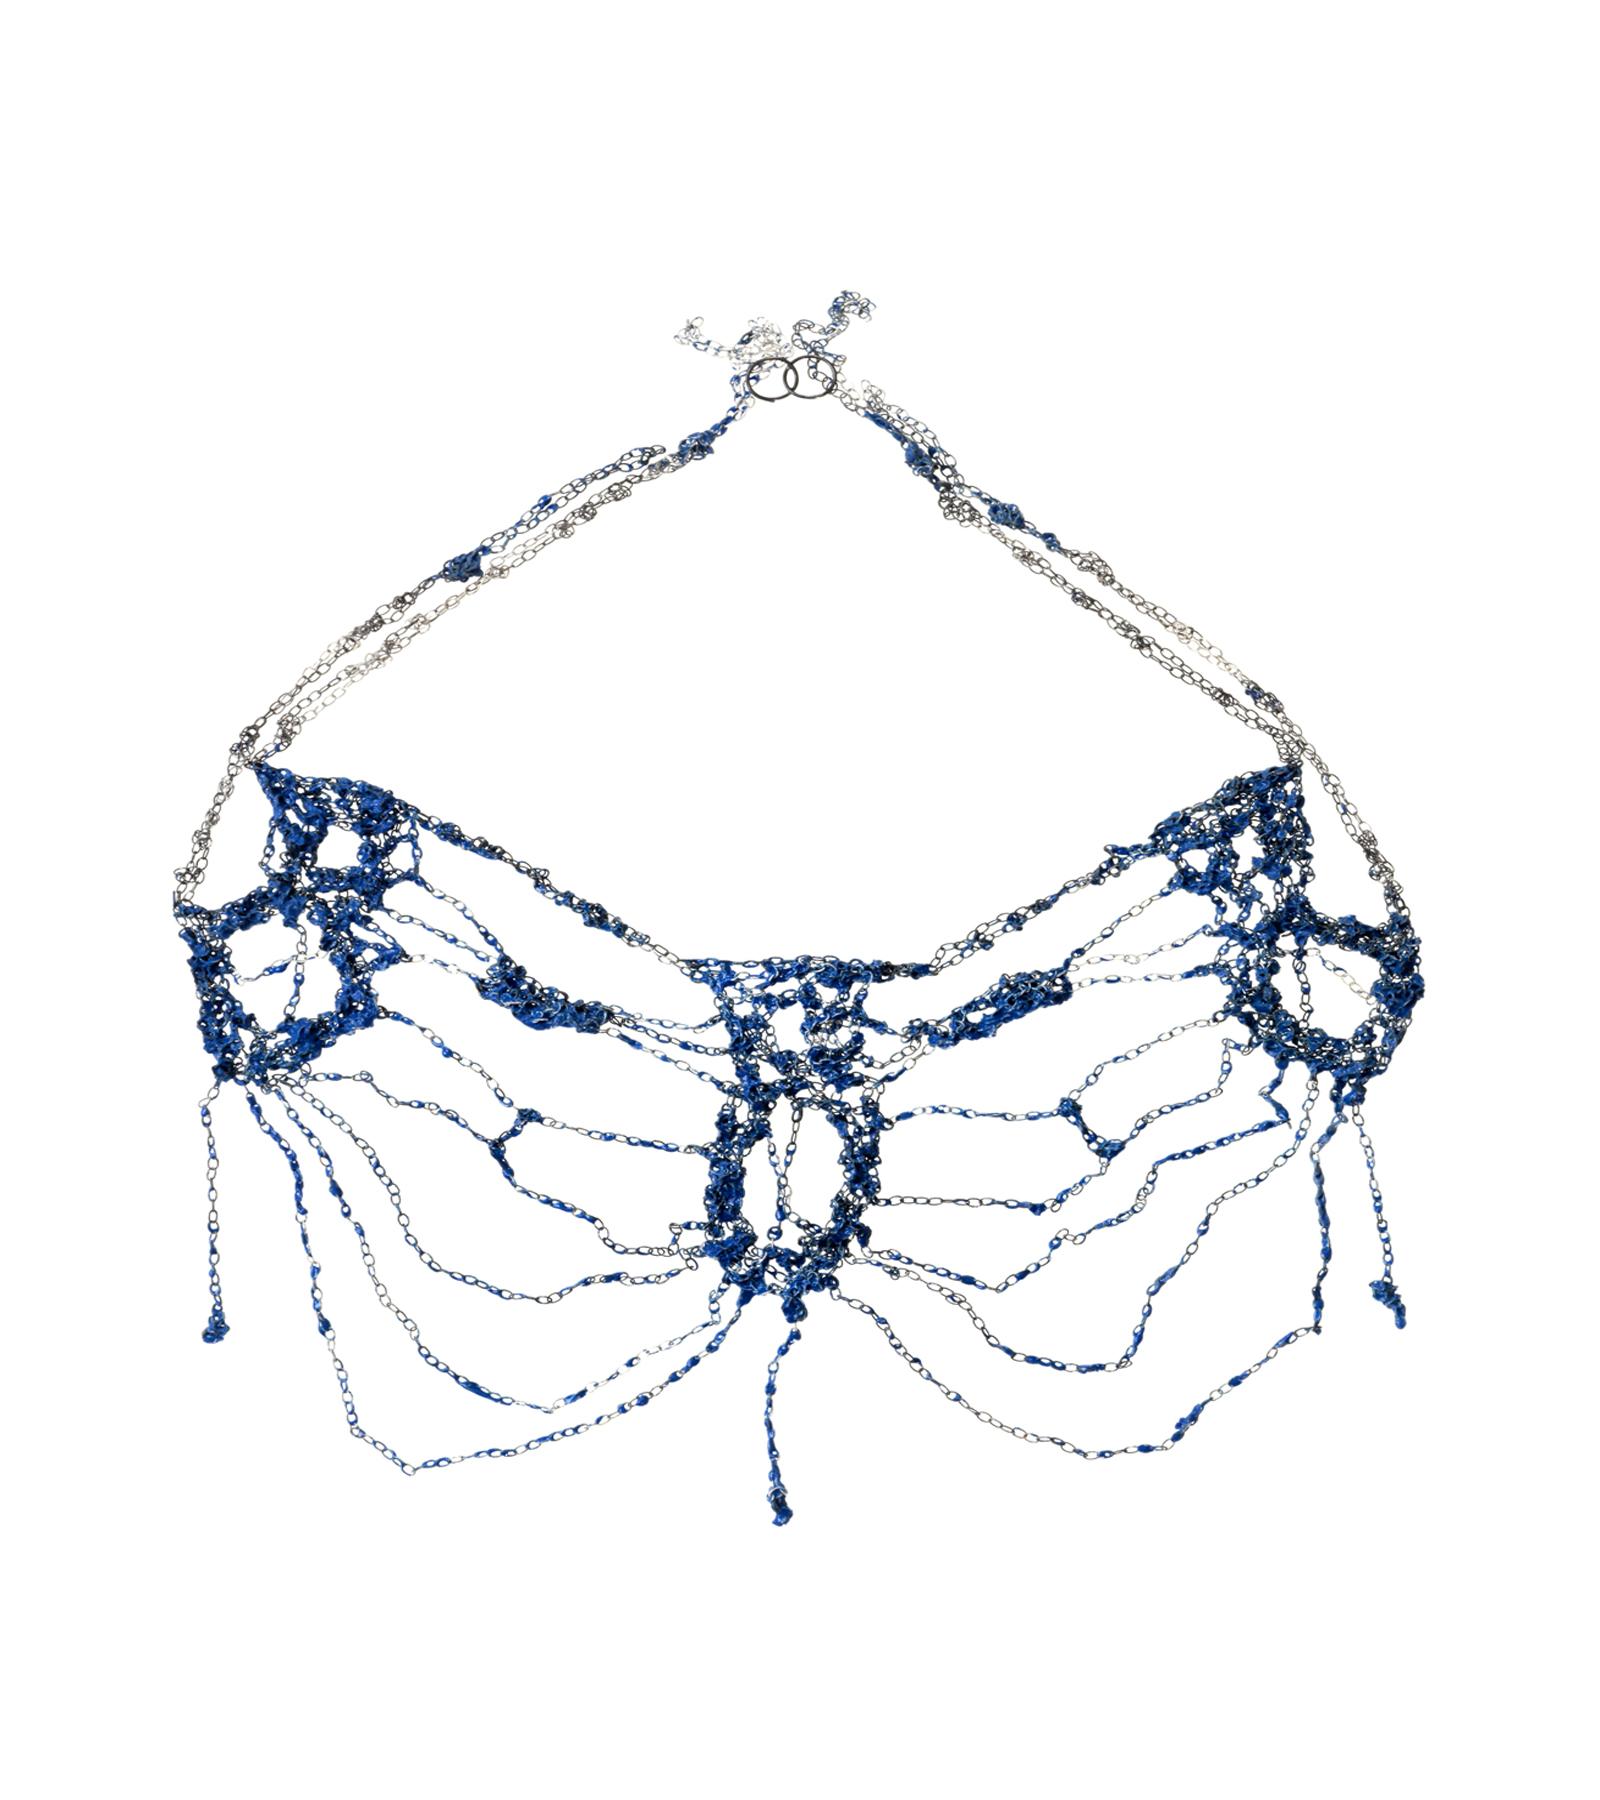 Royal Blue Istos Necklace 01, 2012